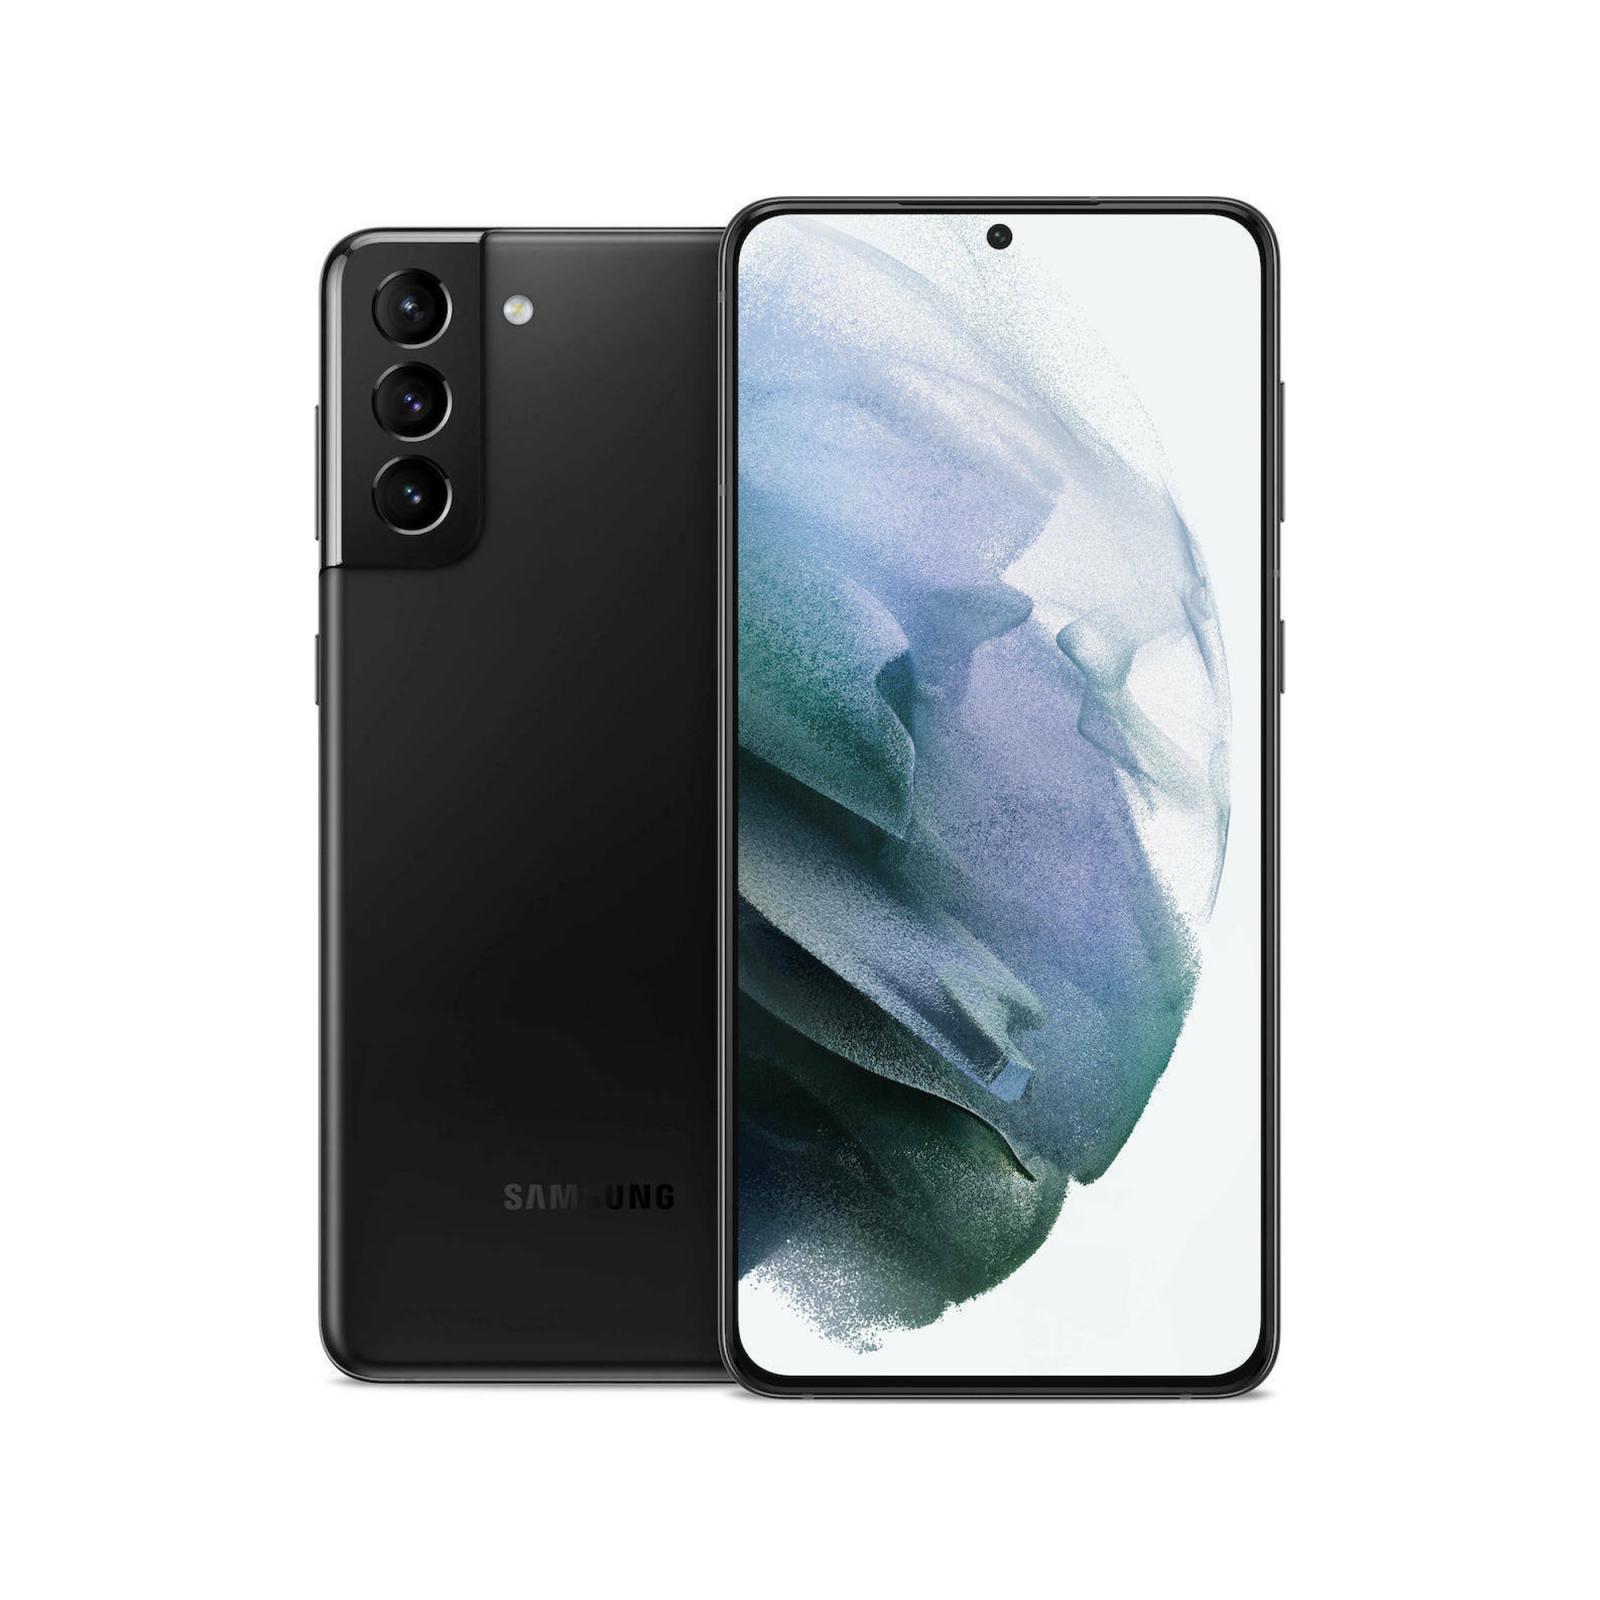 Samsung Galaxy S21+ 5G (128GB) Phantom Black